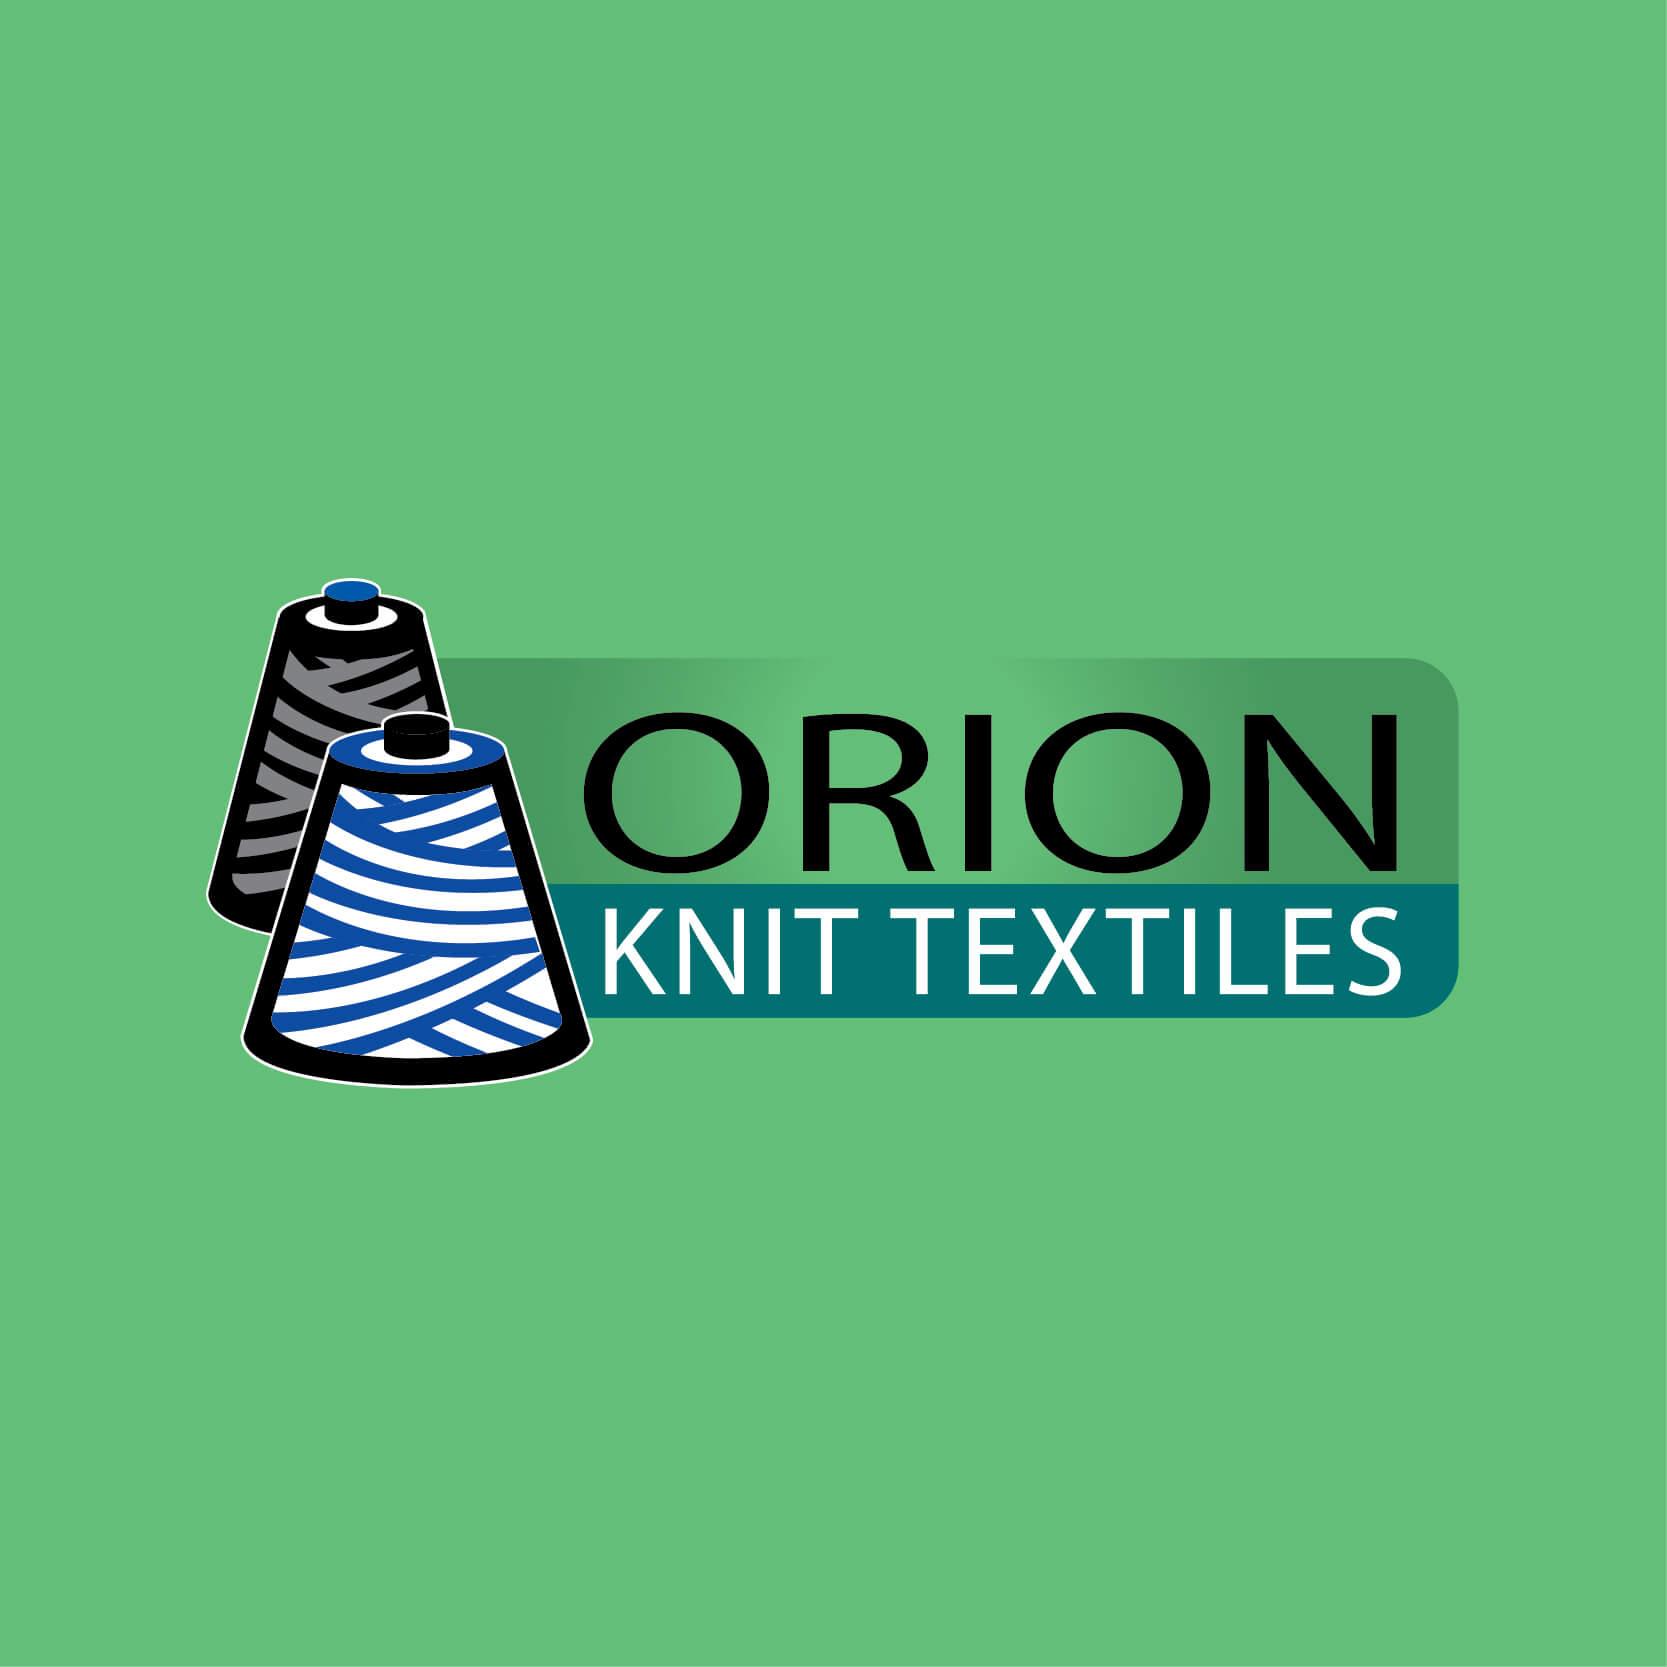 DTC-Clients-Served-Logo-Orion Knit Textiles